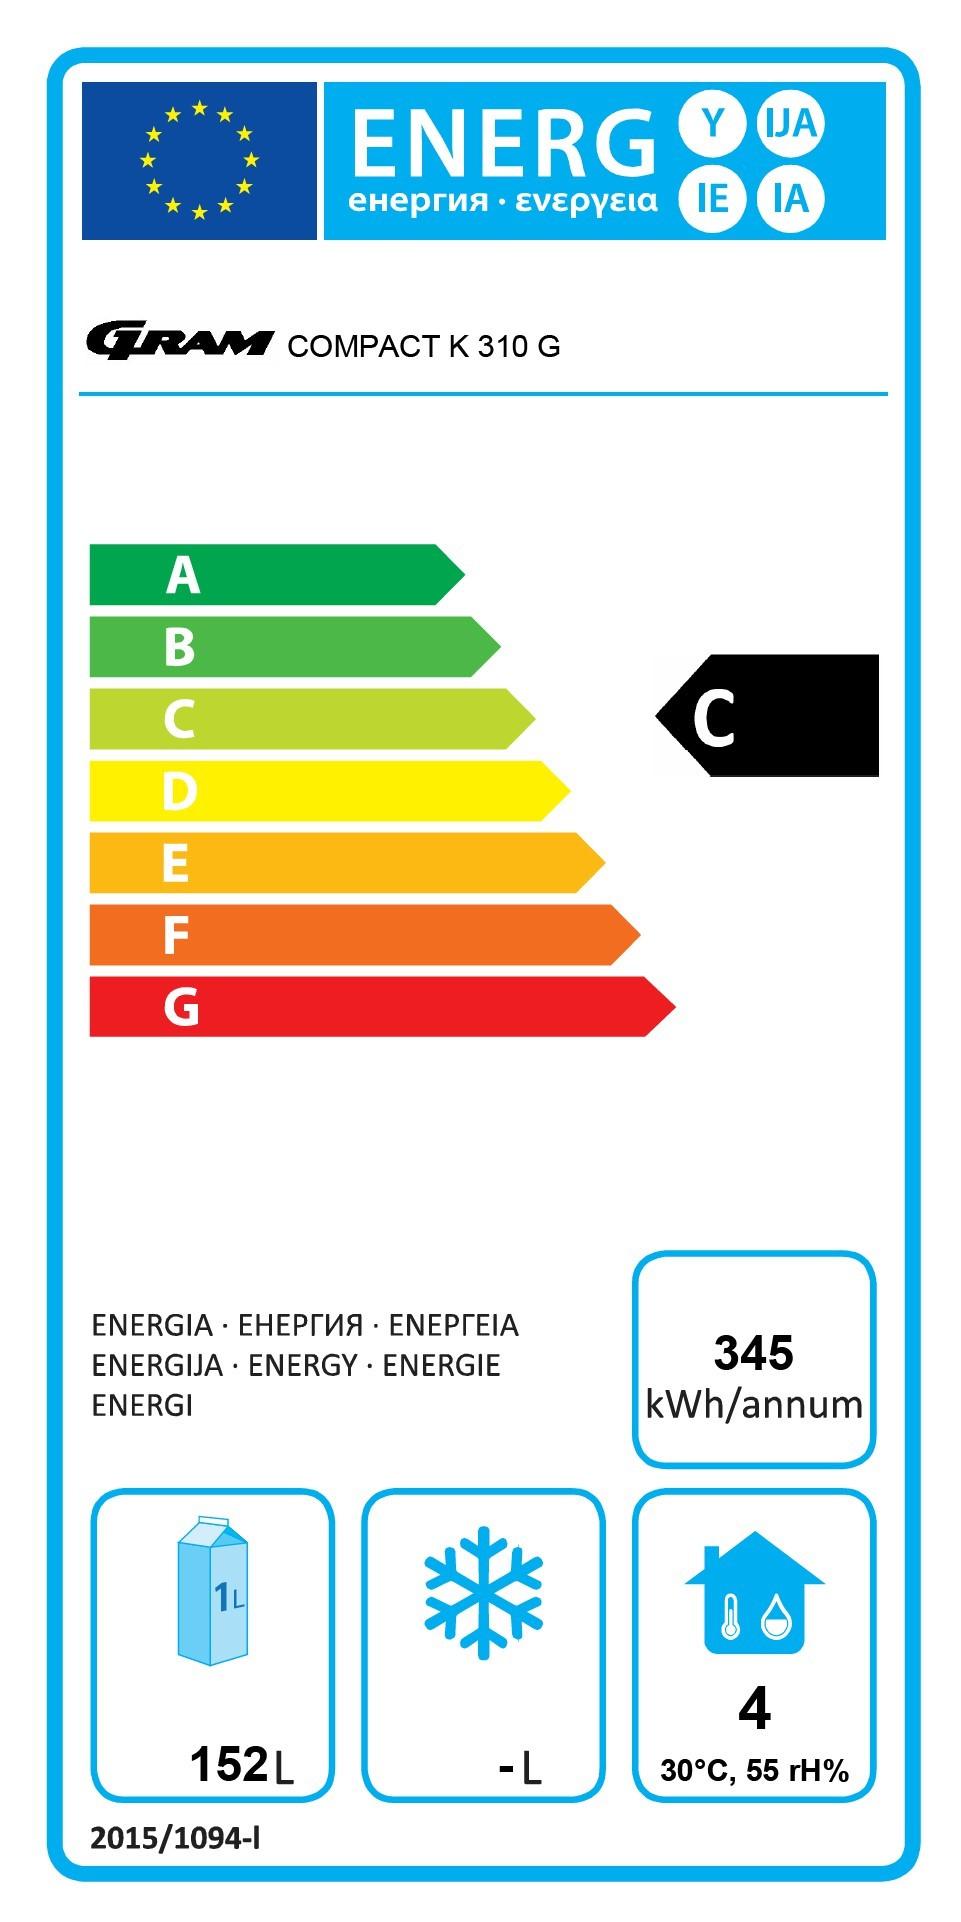 COMPACT KG 310 LG C 4W 218 Ltr Glass Door Display Fridge Energy Rating